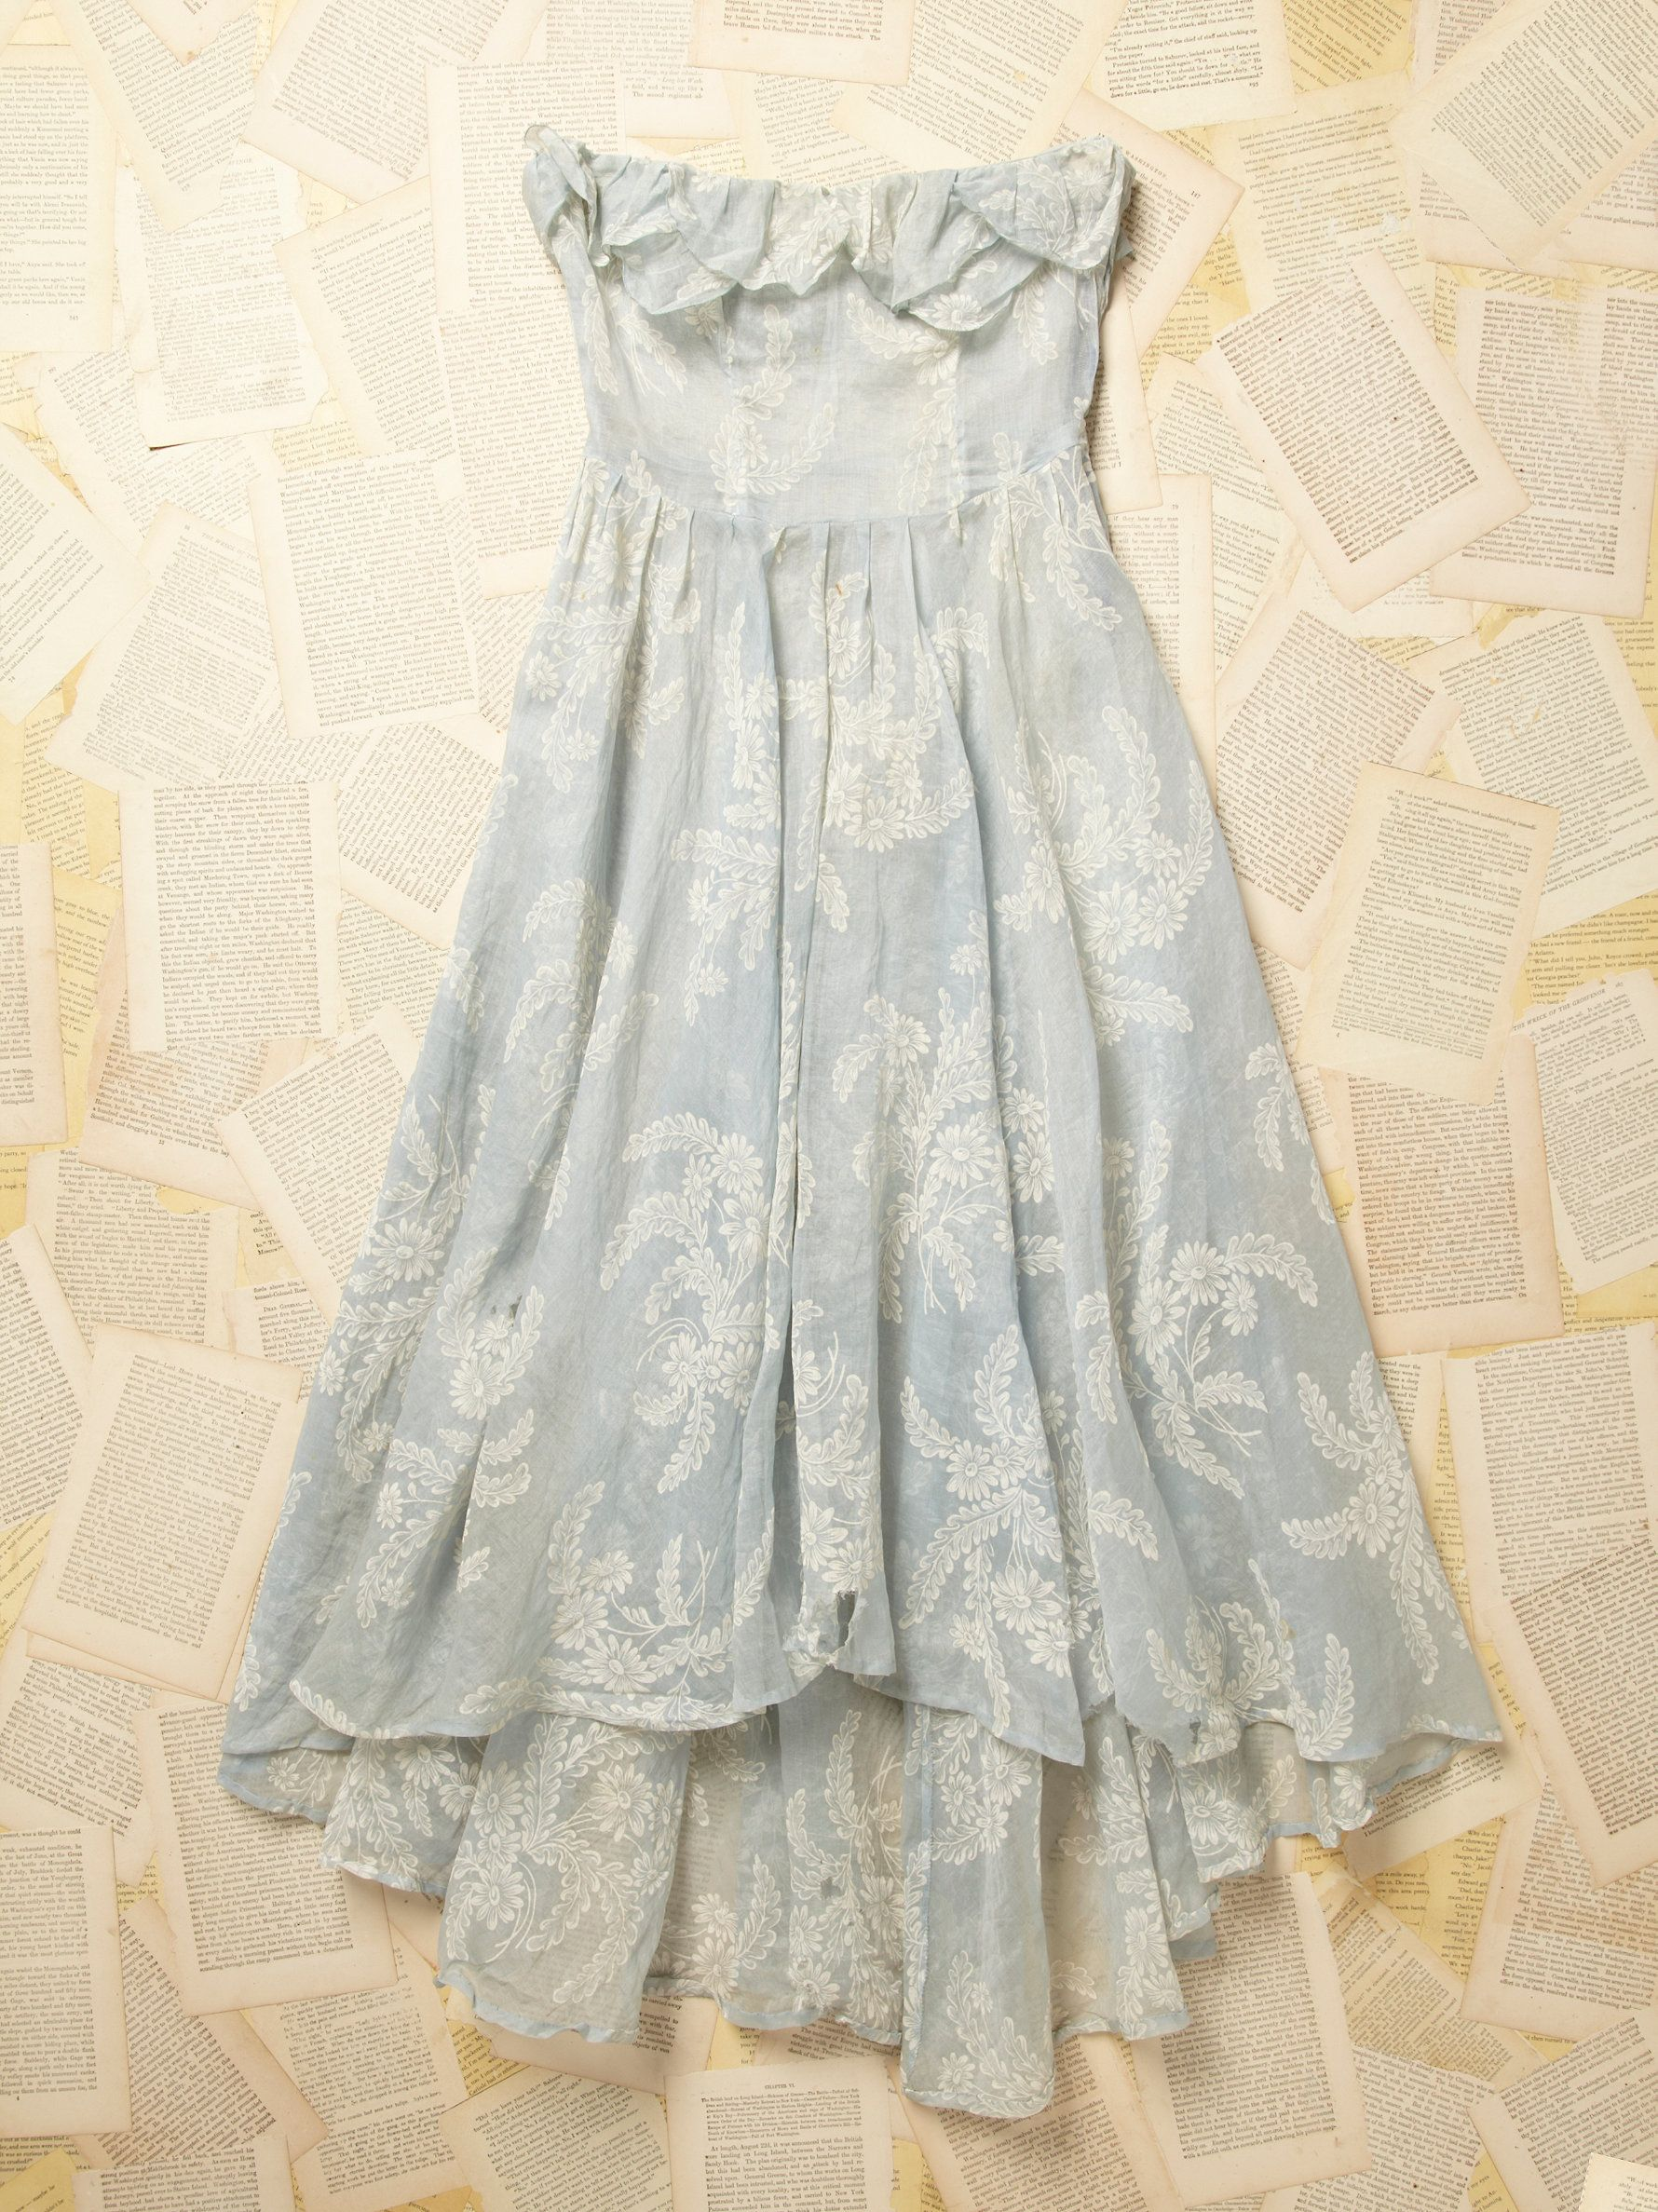 Free People   Vintage 1950s Dress. Rehearsal dinner dress <3